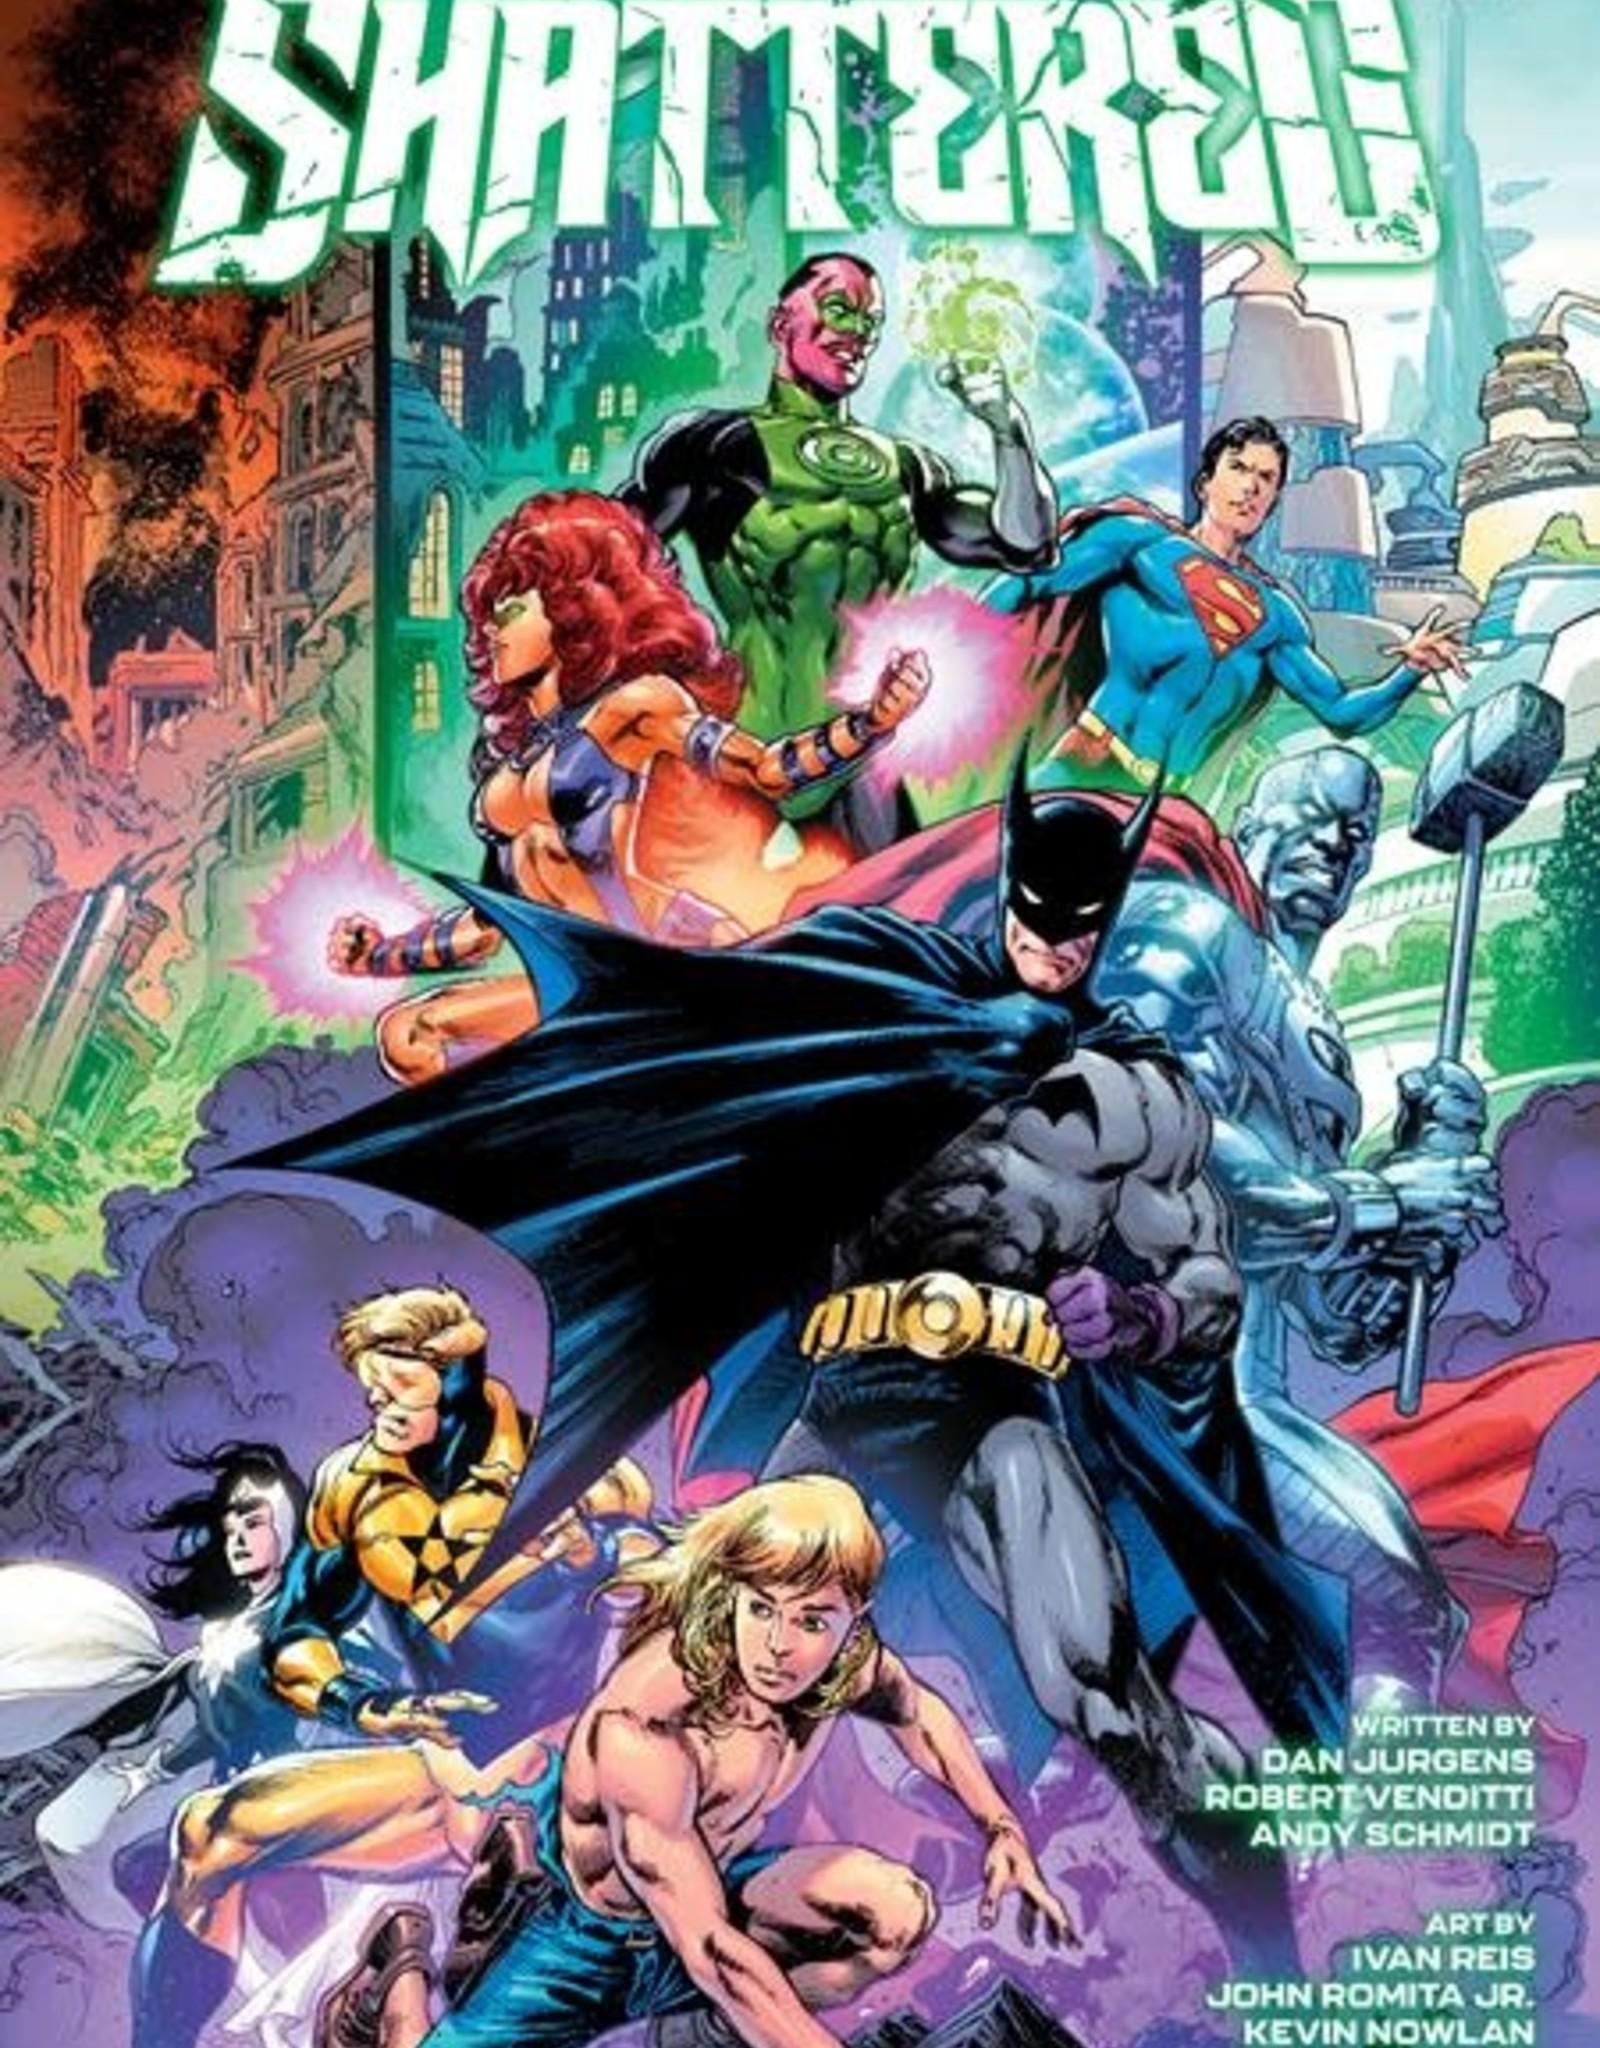 DC Comics Generations Shattered #1 (one Shot) Cvr A Ivan Reis & Joe Prado